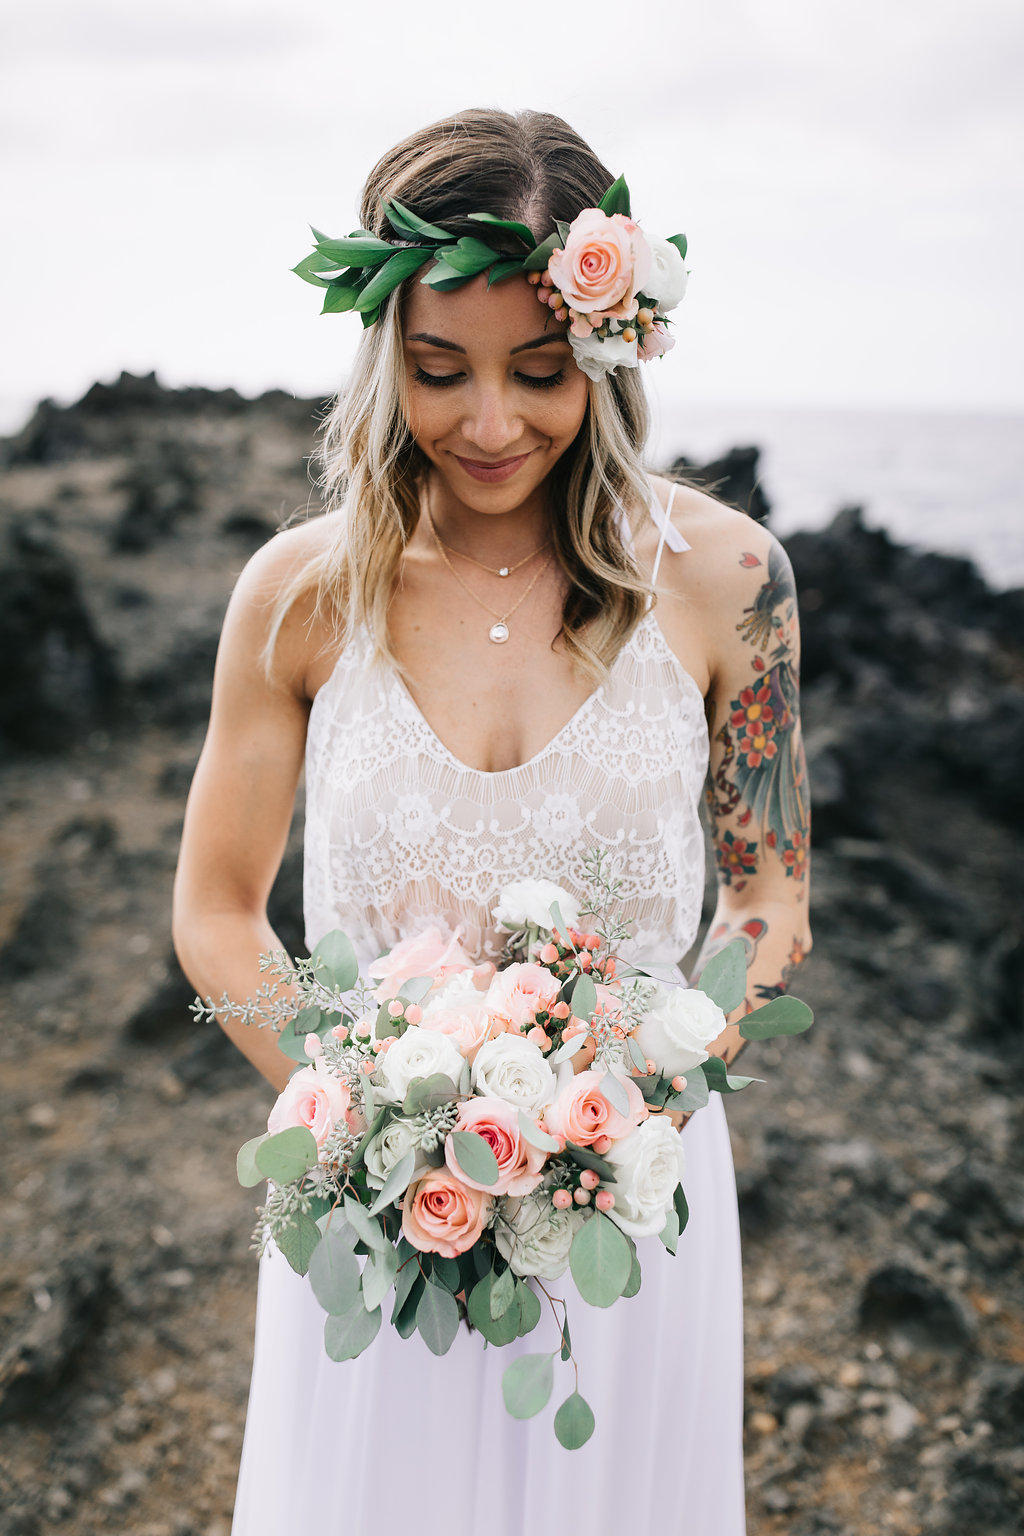 Maui Beach Bride